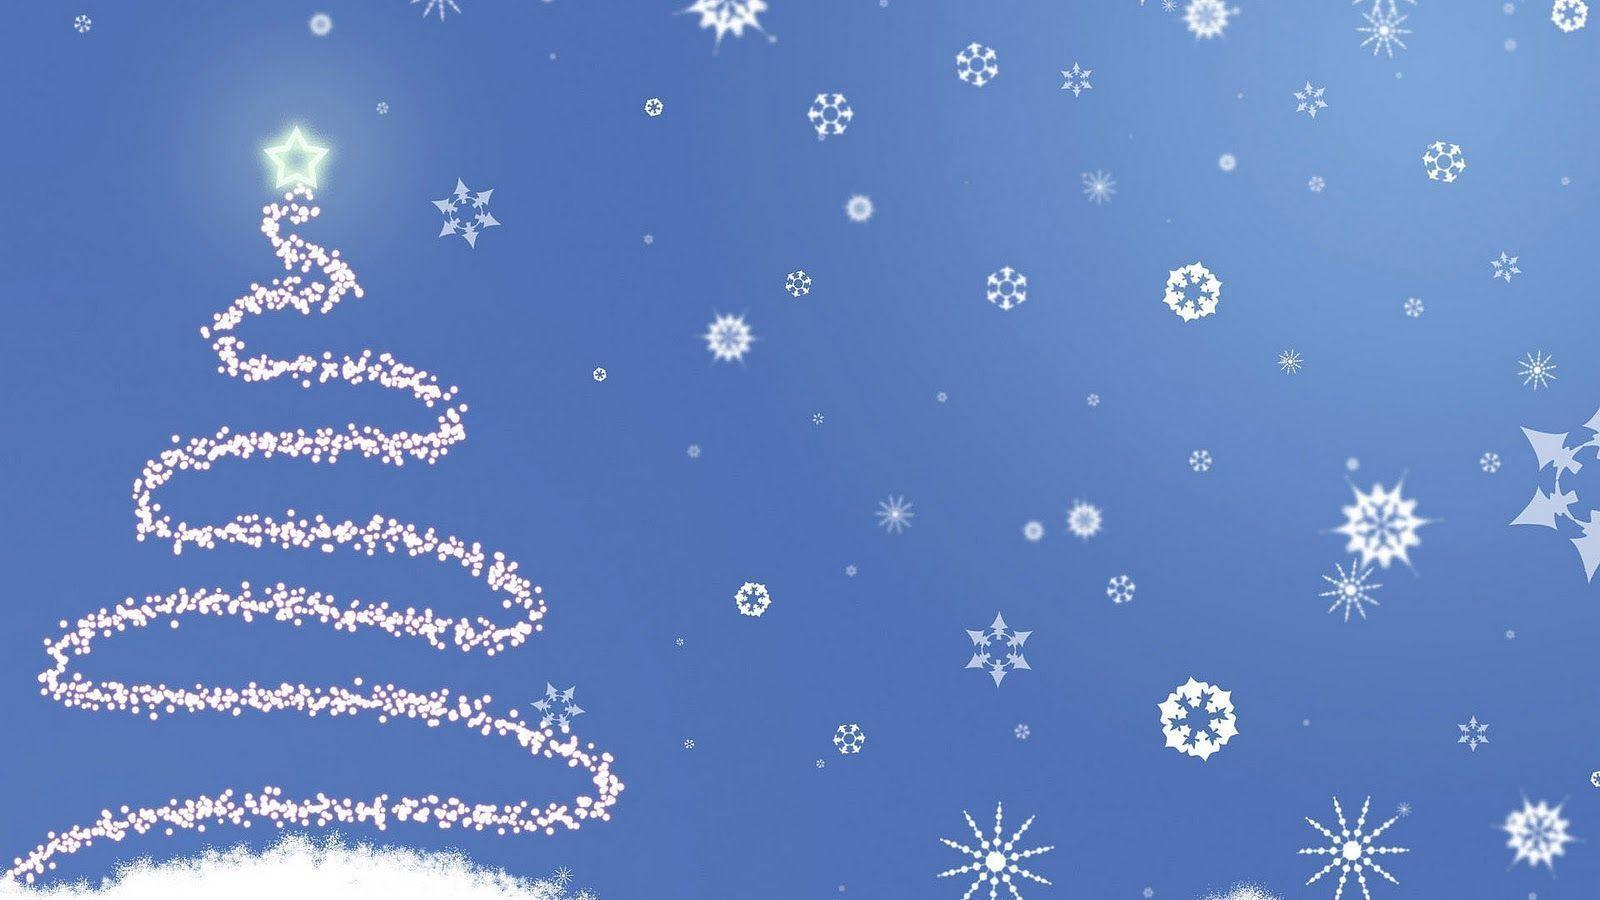 Holiday Desktop Backgrounds Tree